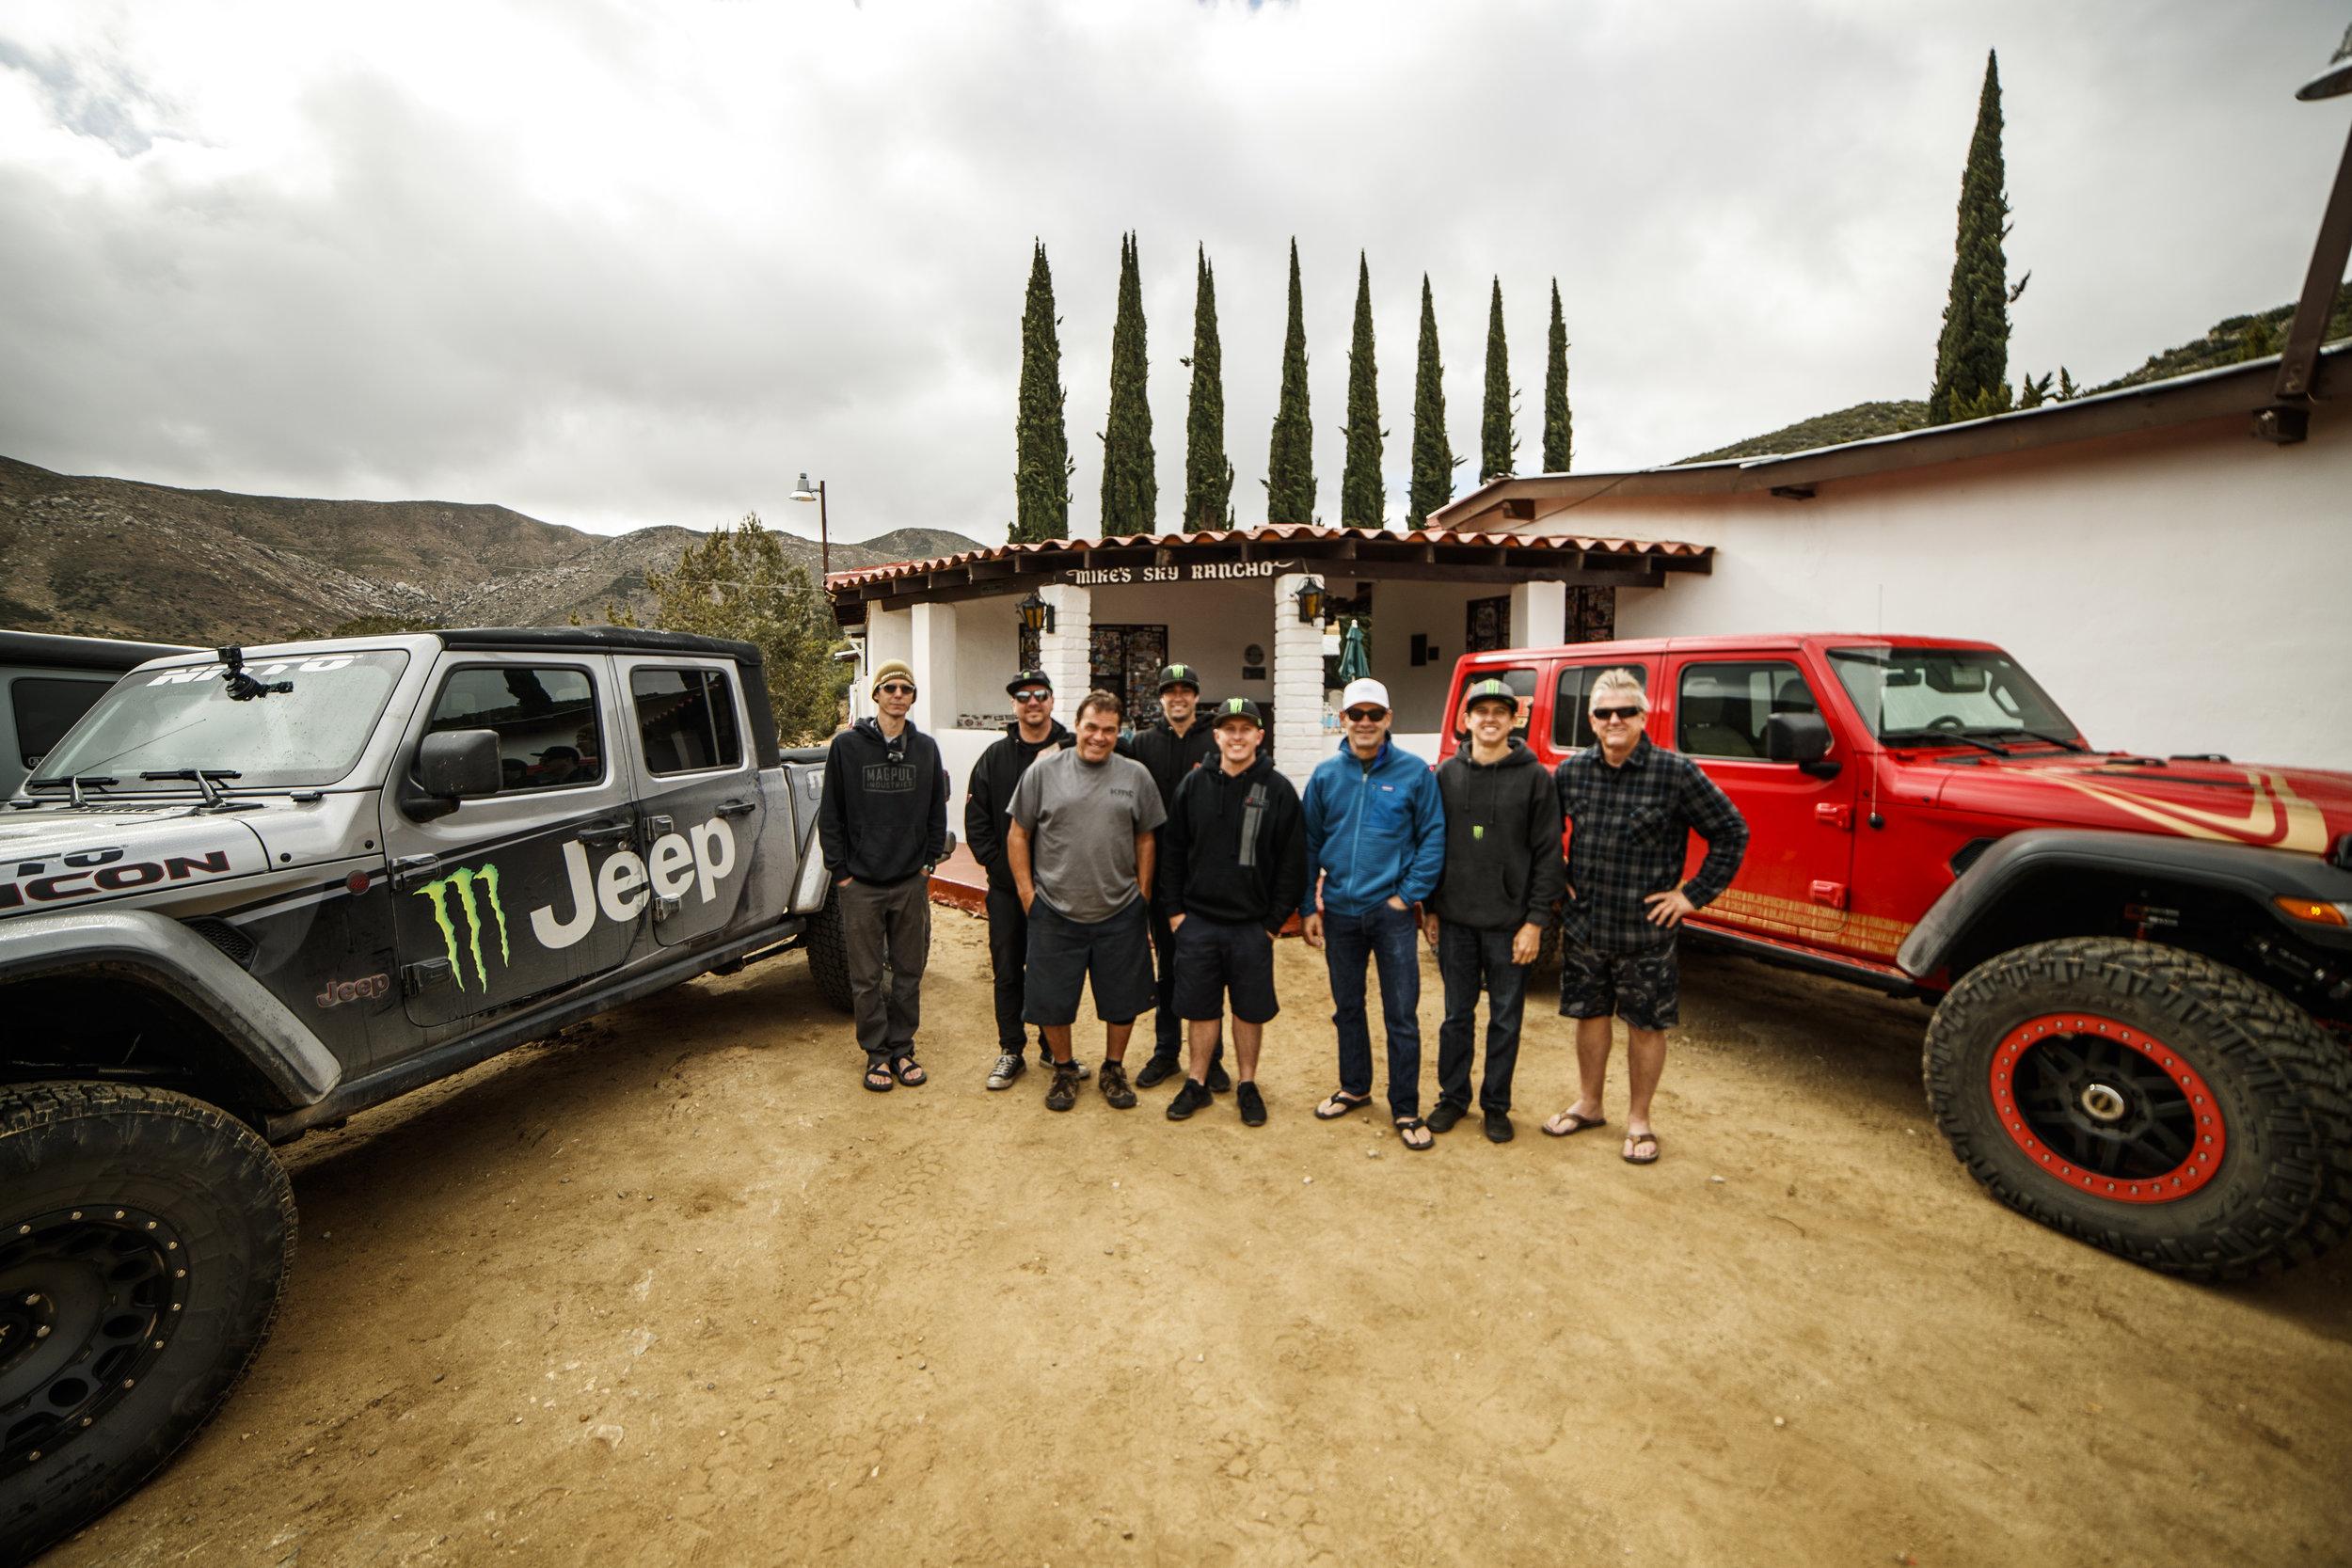 6_24_CaseyCurrie_Baja500PreRunning_BajaMexico_Jeep_009.jpg